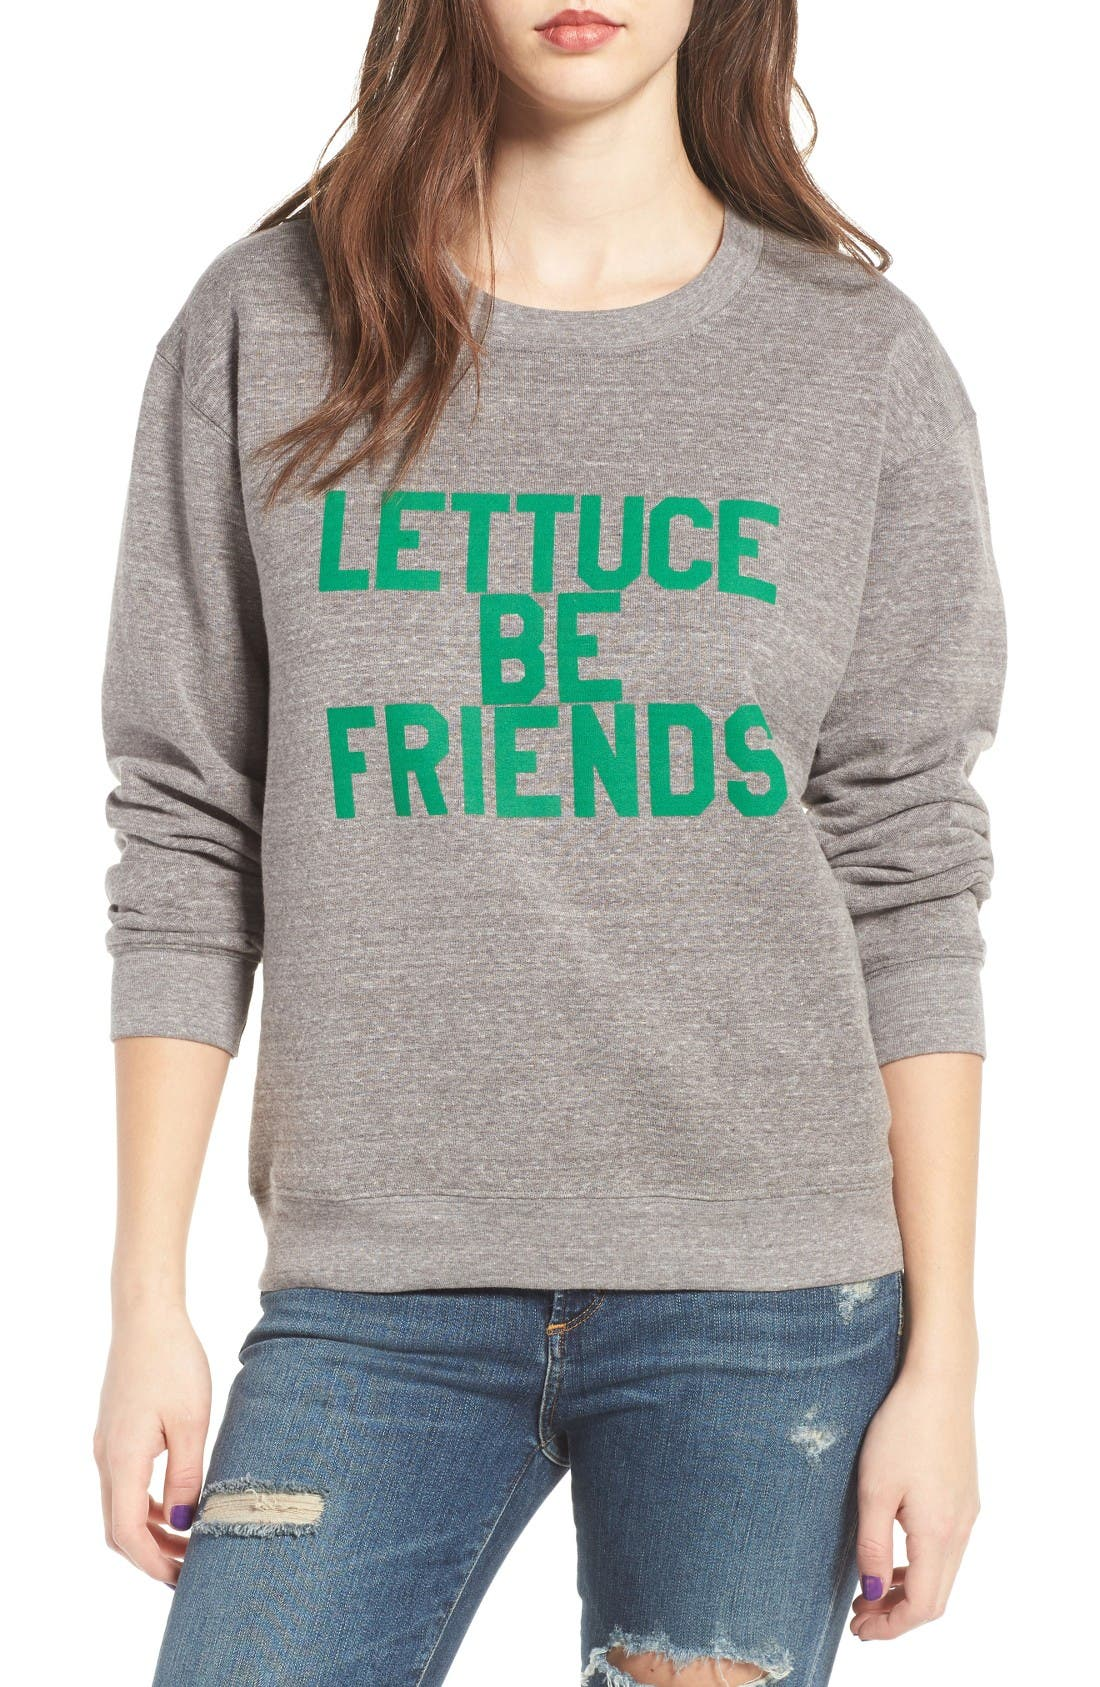 Alternate Image 1 Selected - Sub_Urban Riot Lettuce Be Friends Sweatshirt